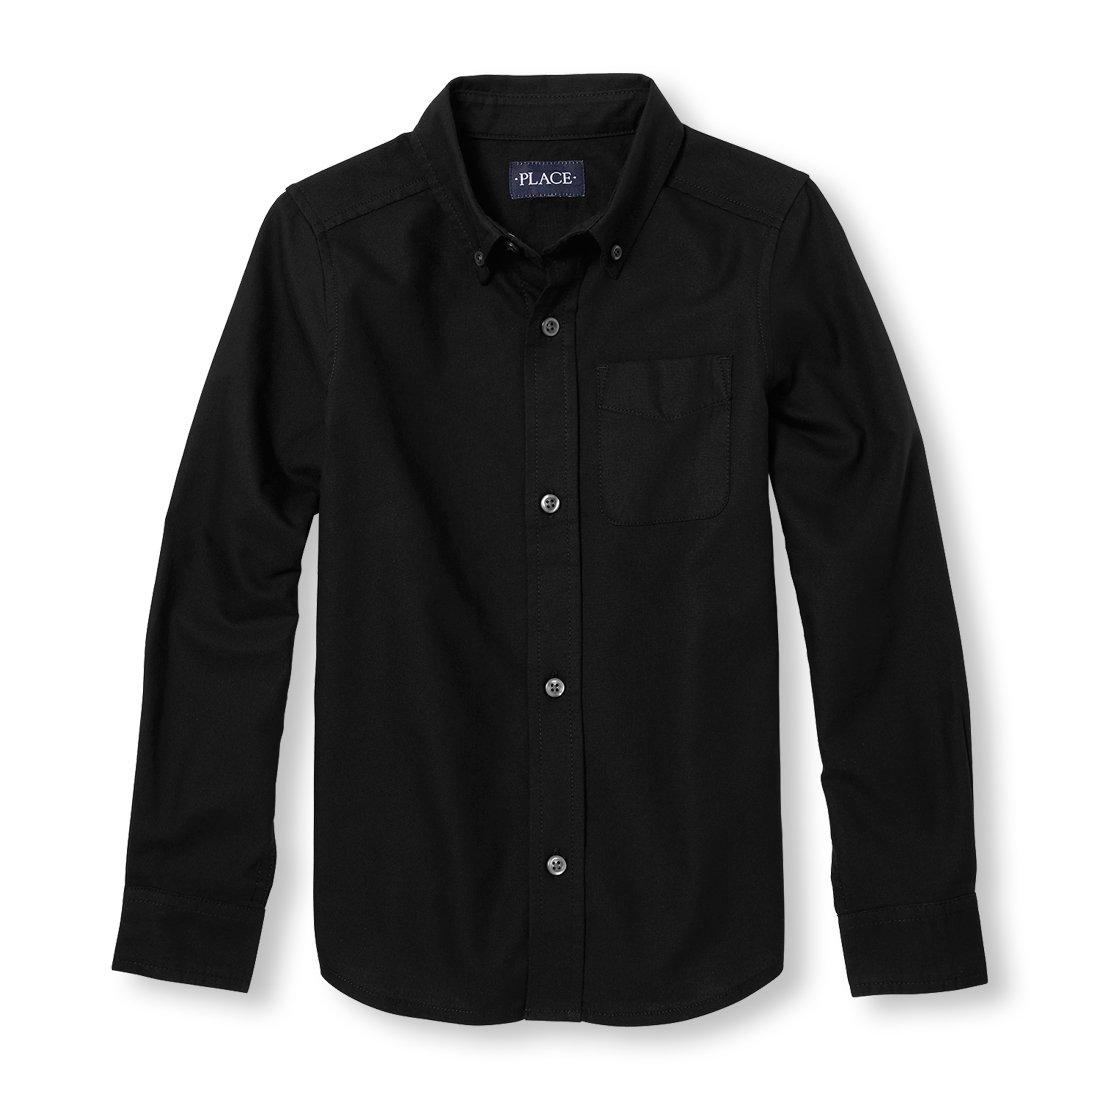 The Children's Place Big Boys' Long Sleeve Button-up Shirt, Black 02432, S (5/6)